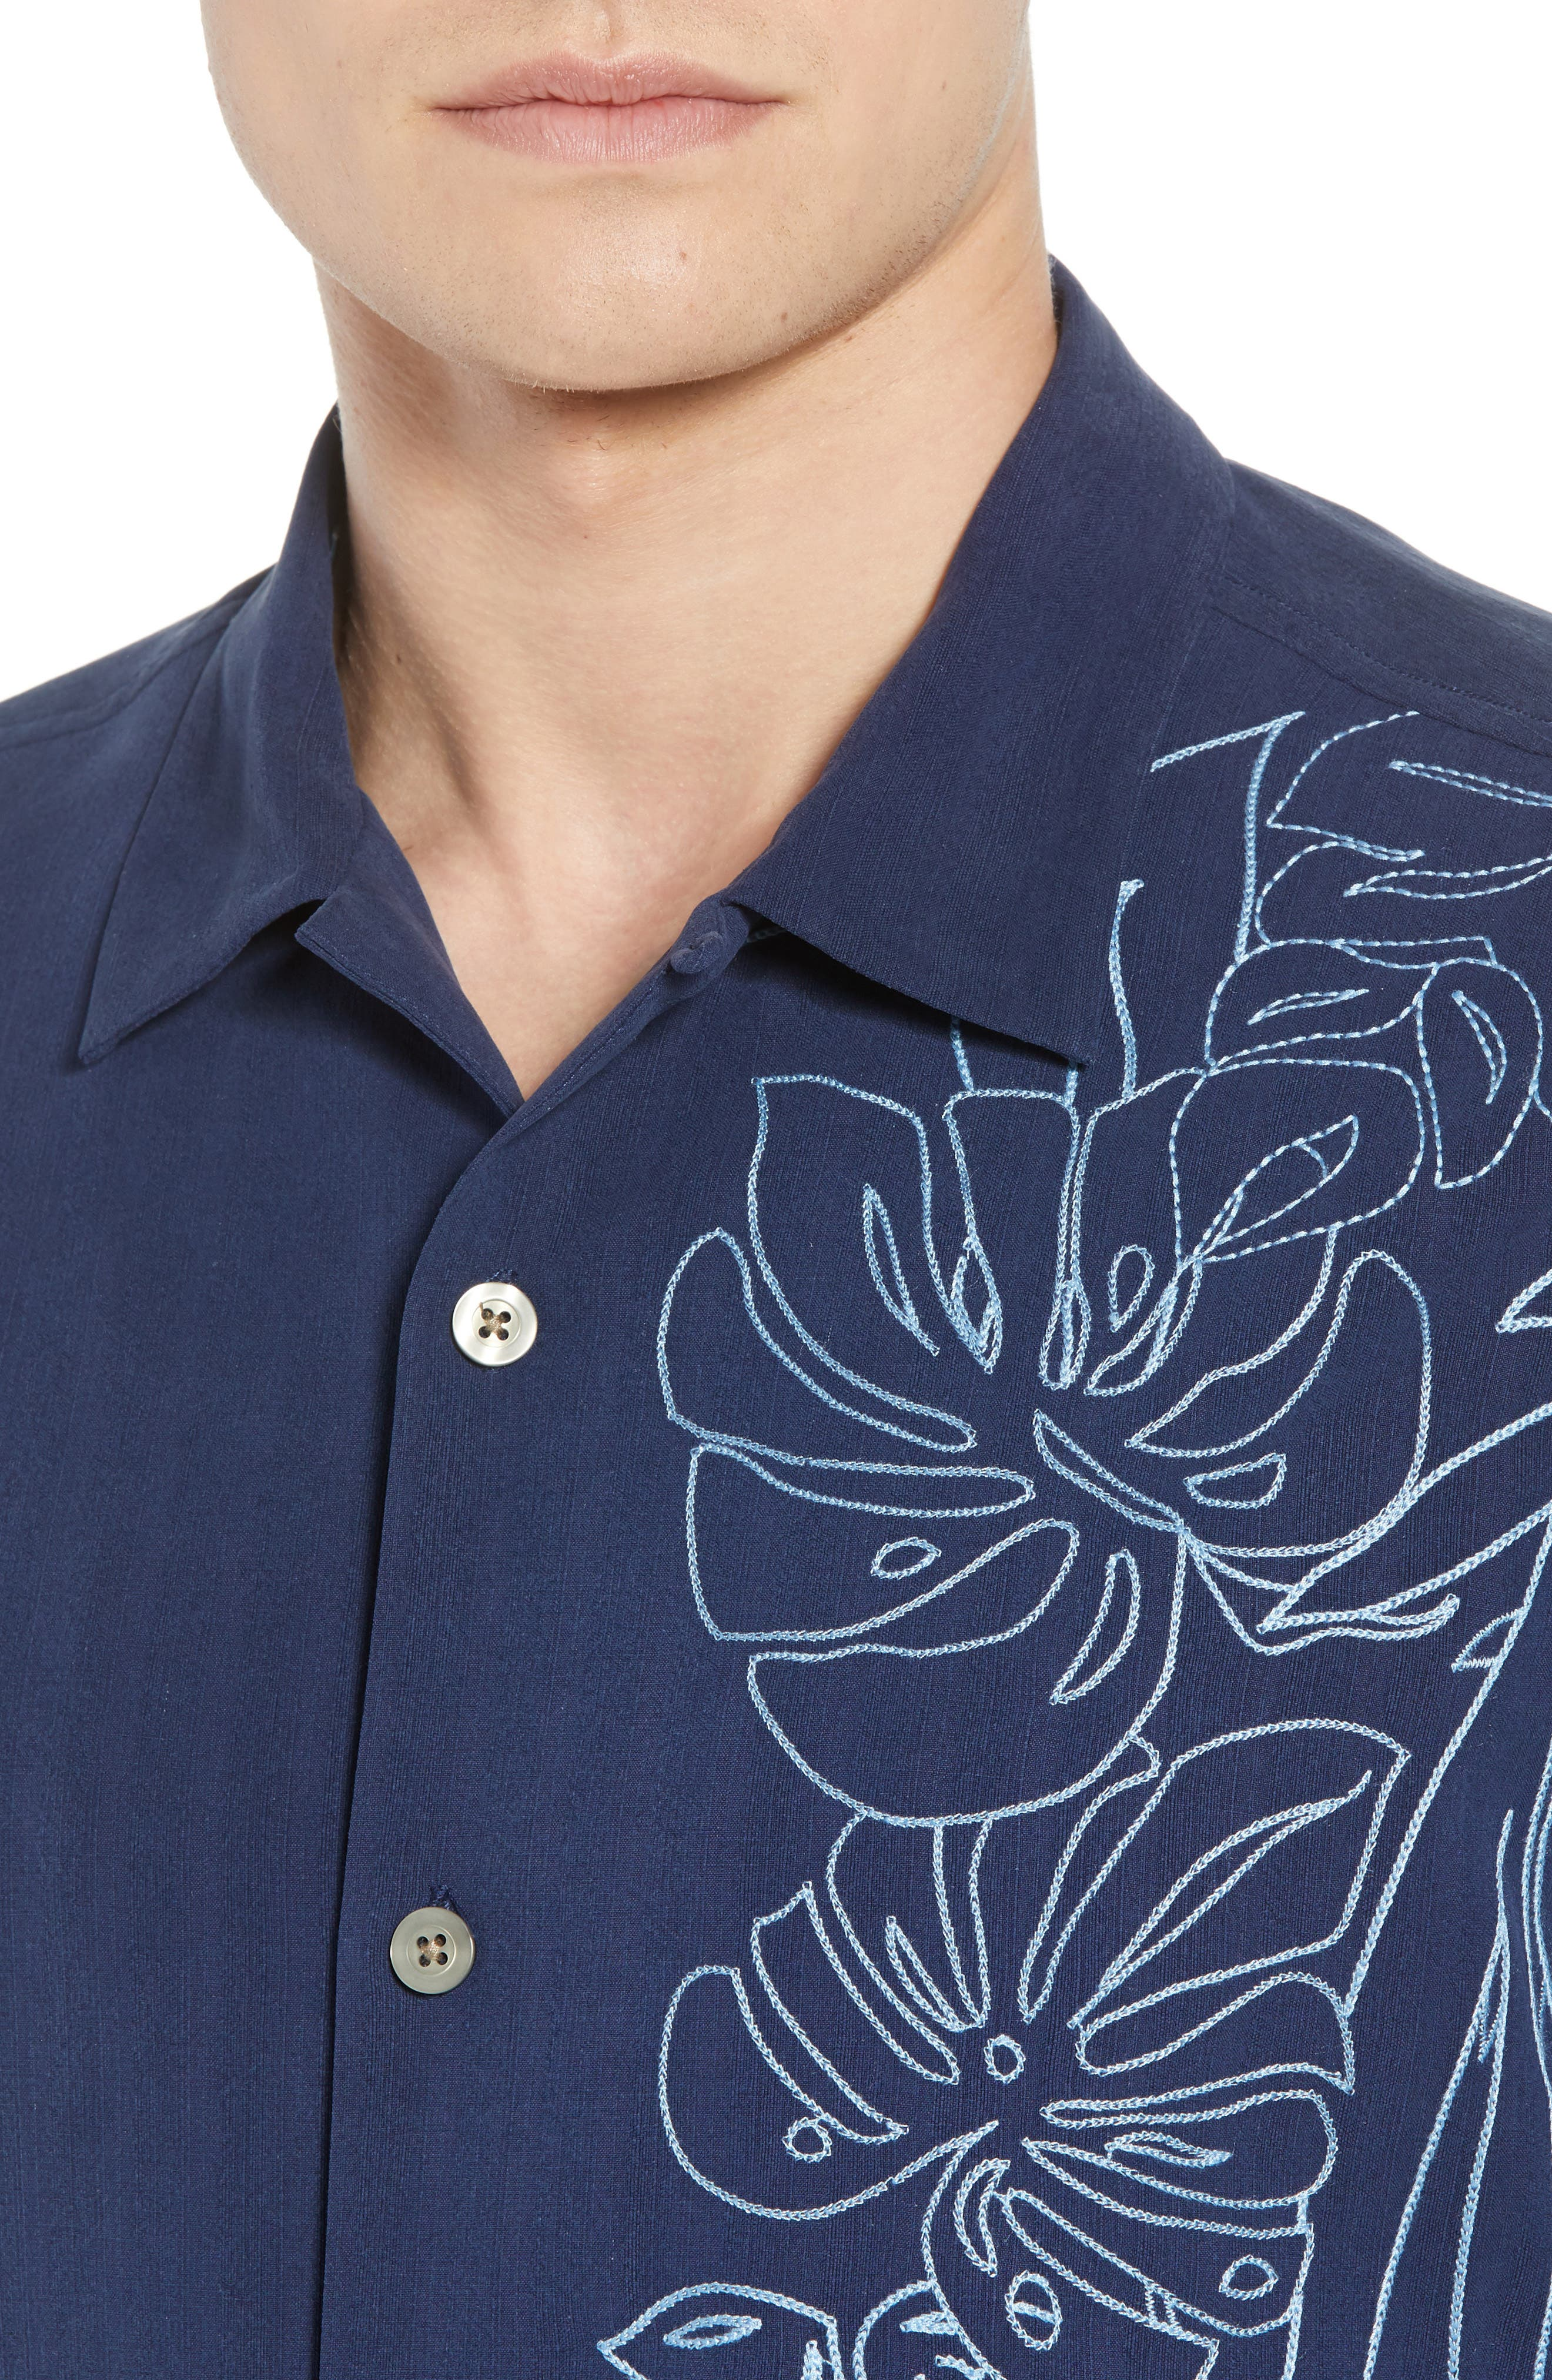 Playa Palmas Silk Camp Shirt,                             Alternate thumbnail 4, color,                             OCEAN DEEP